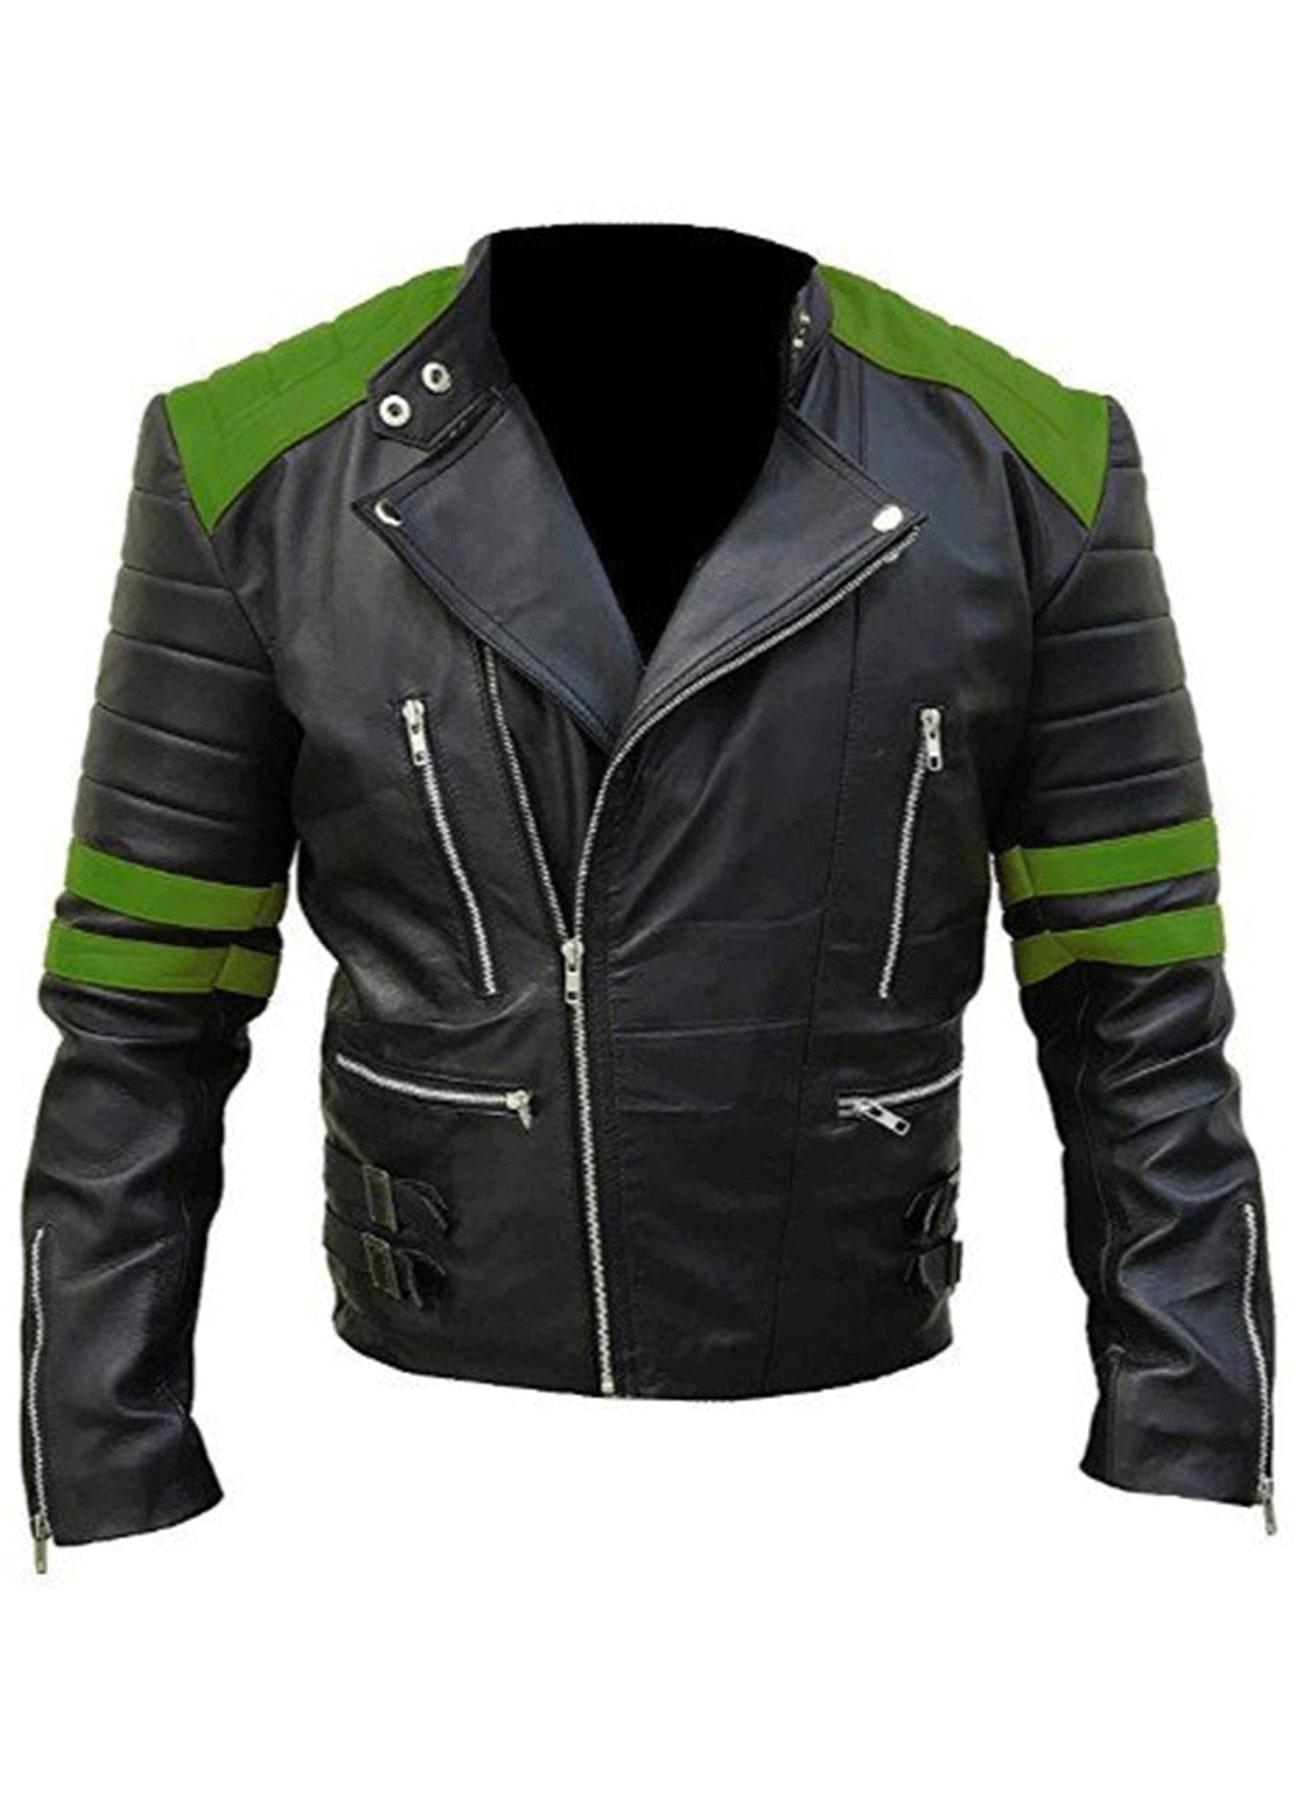 Genuine Leather Jacket - Classic Biker Motorcycle Black & Green Jacket